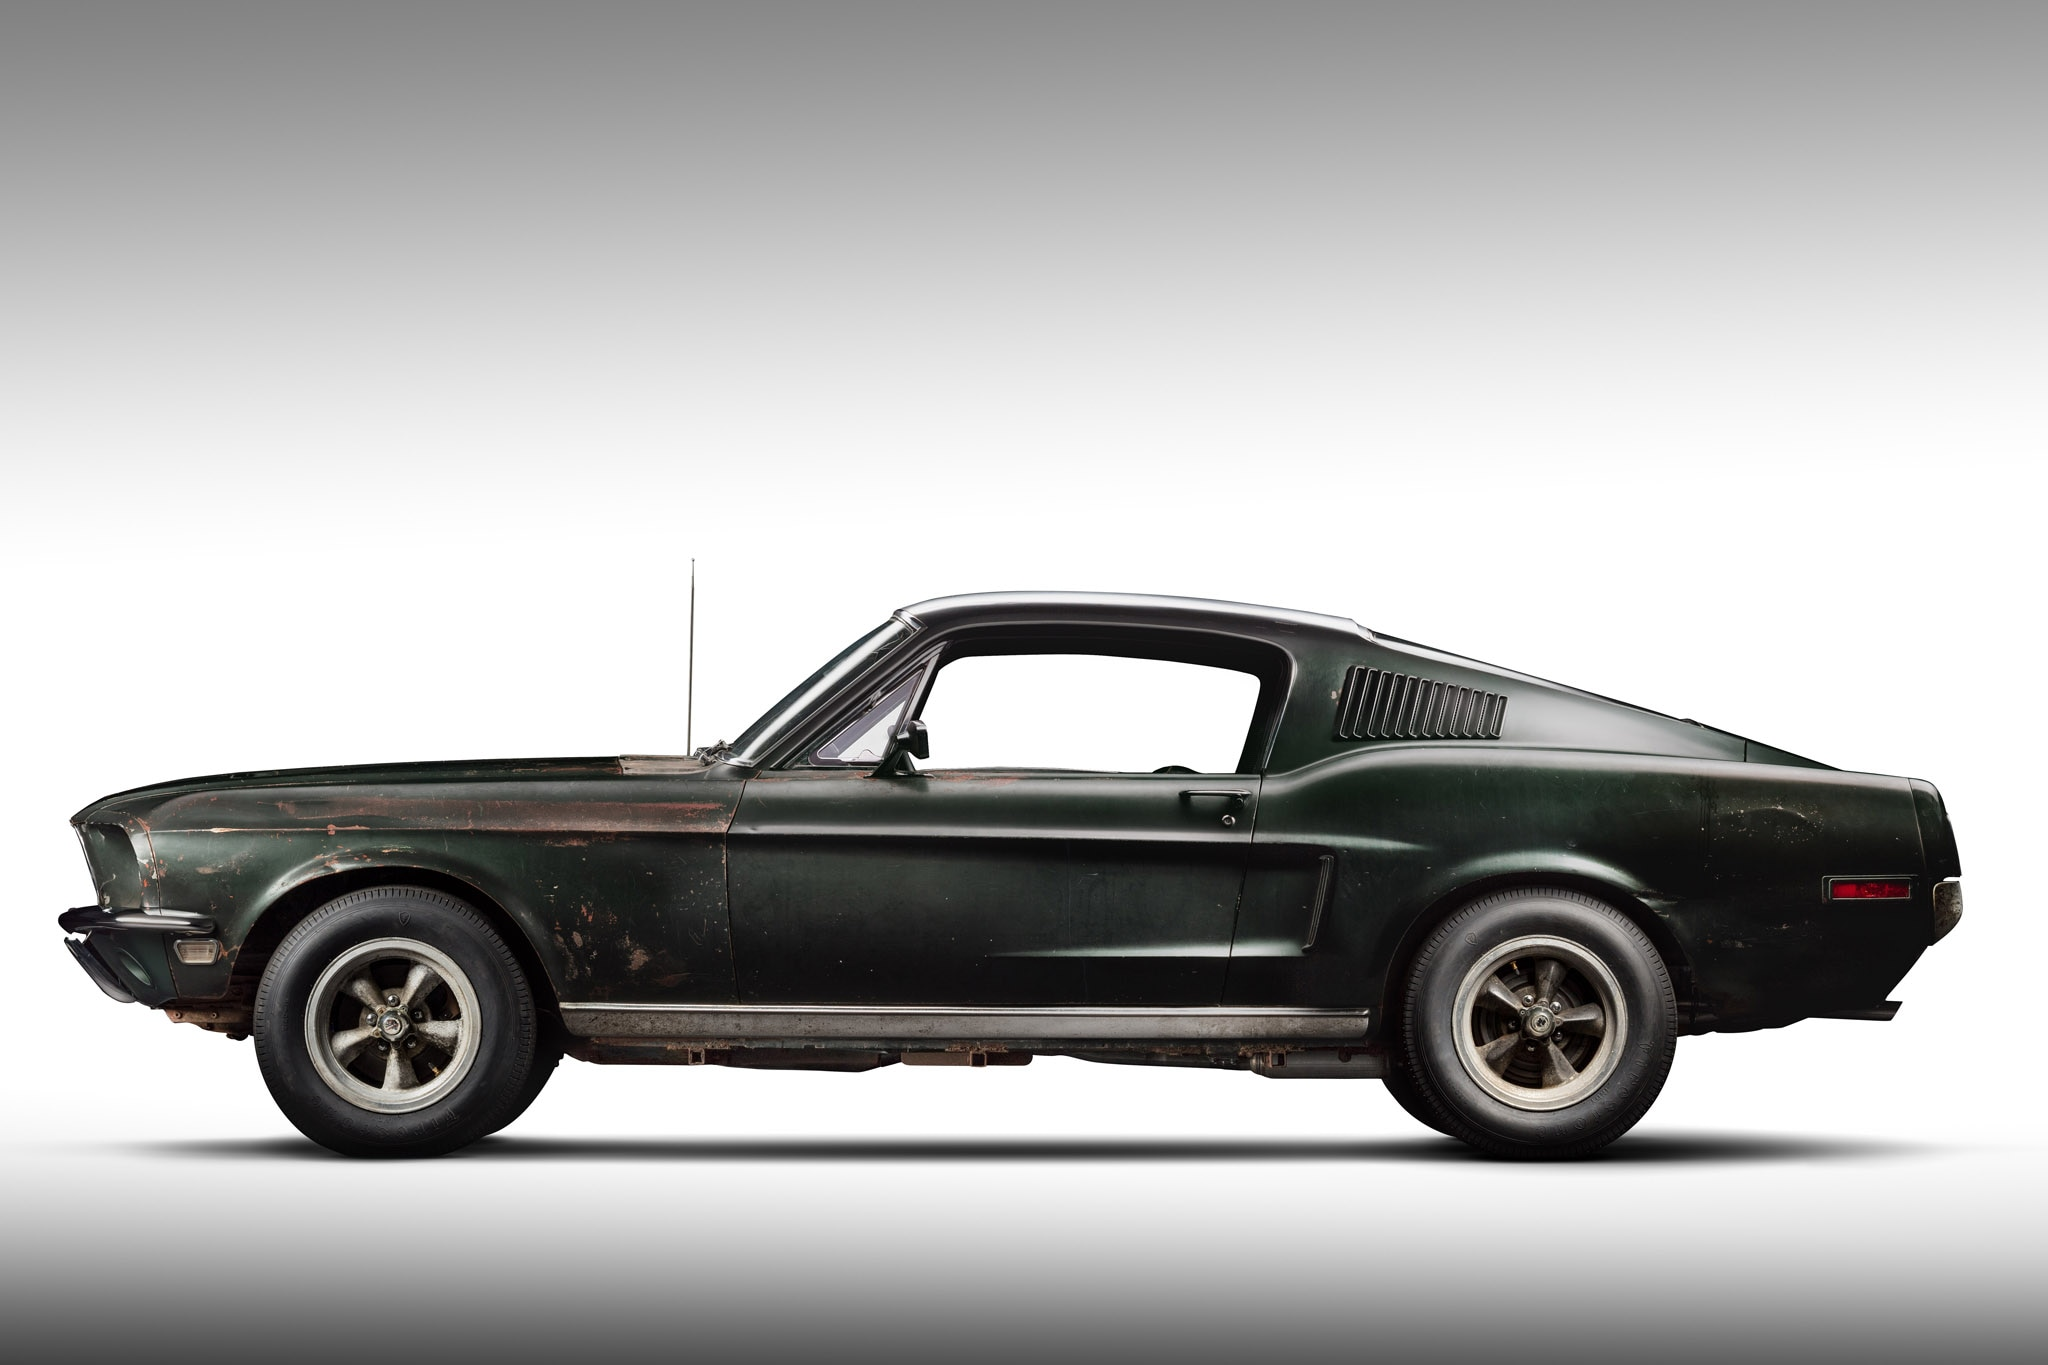 First Drive: 2019 Ford Mustang Bullitt   Automobile Magazine